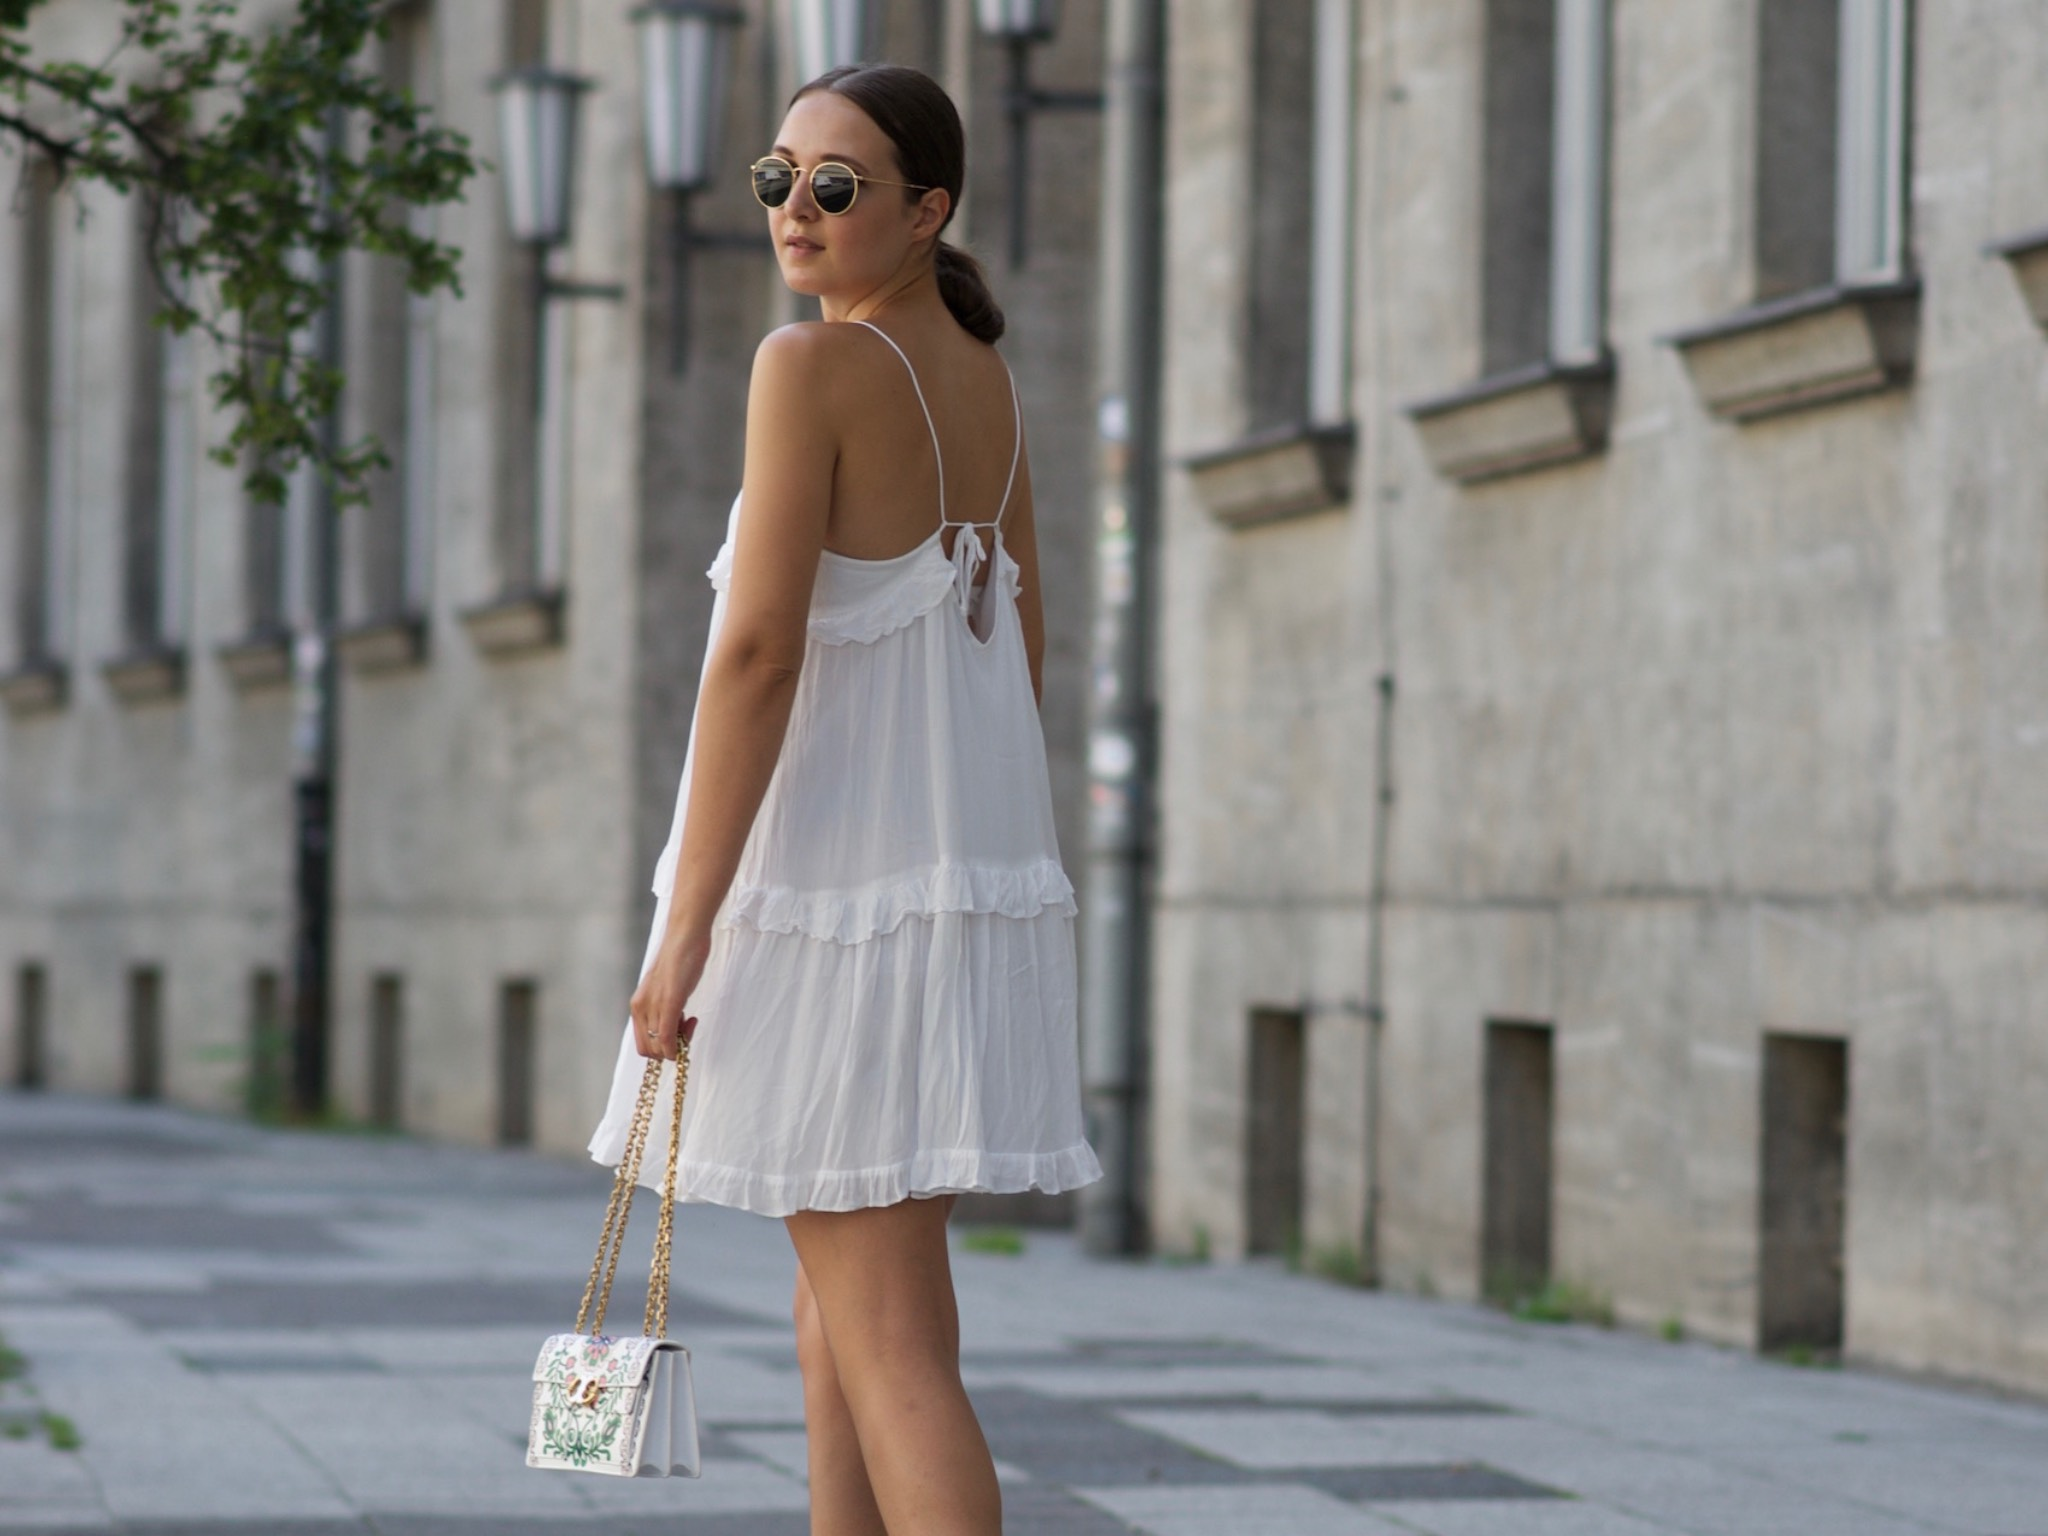 Ines' Outfit für die White Party. Foto: Ines Bali